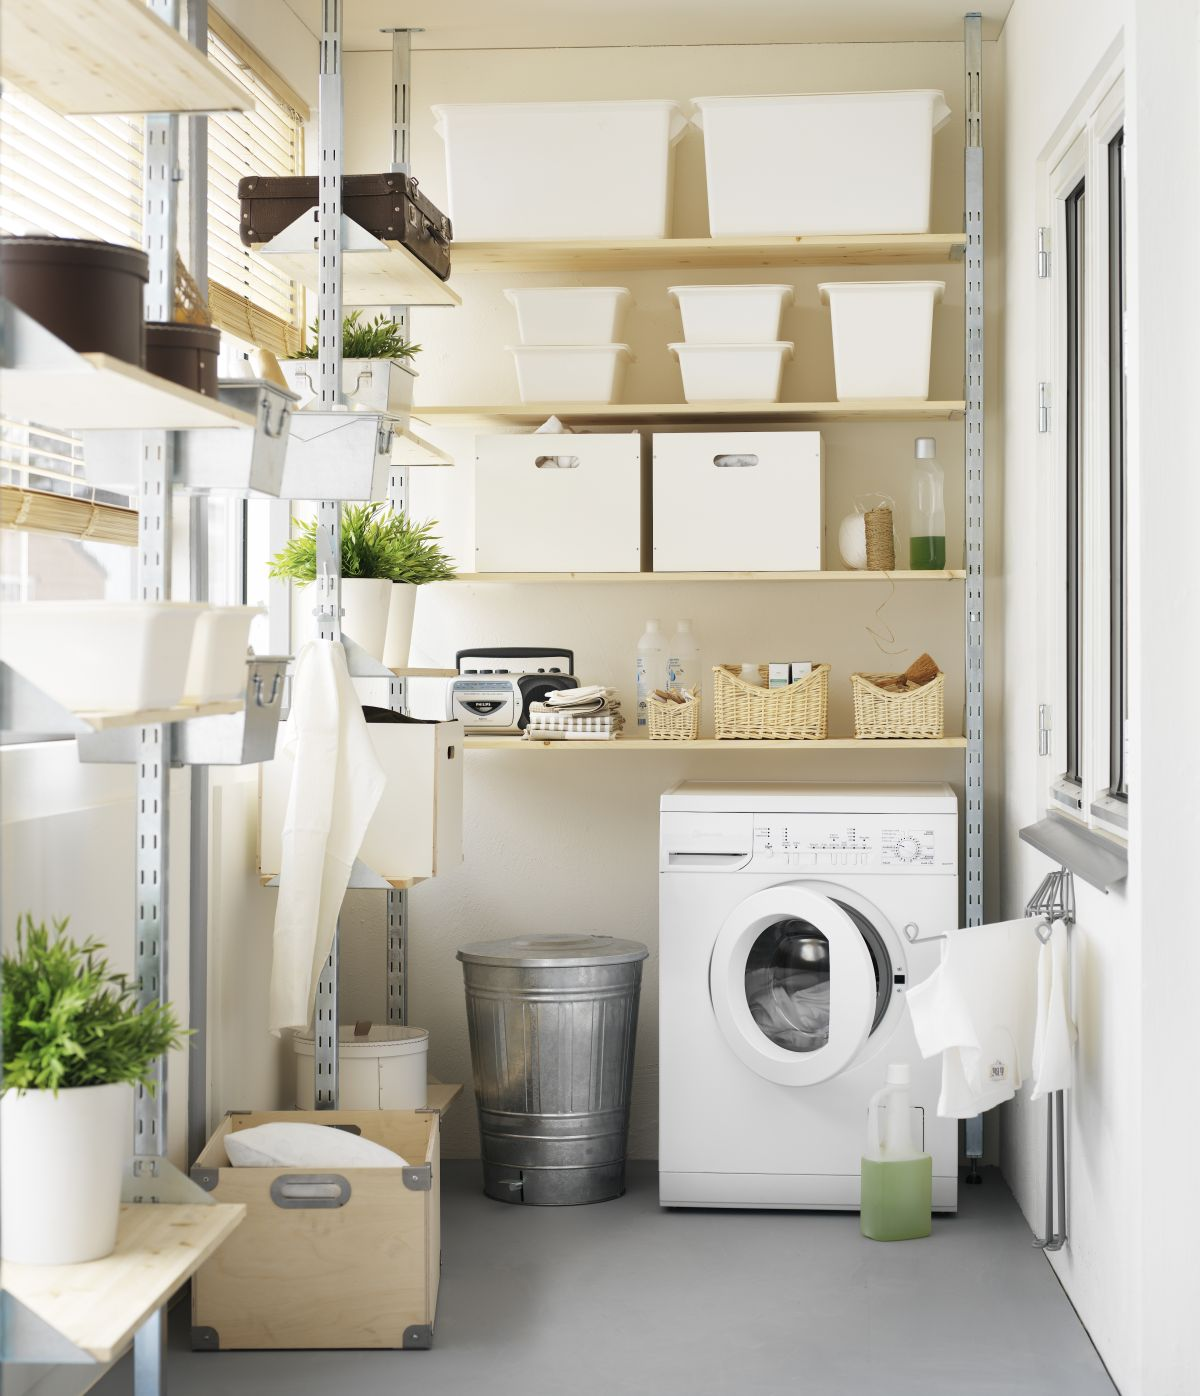 Laundry room storage ideas: 13 ways to make your utility ... on Laundry Room Organization Ideas  id=28985